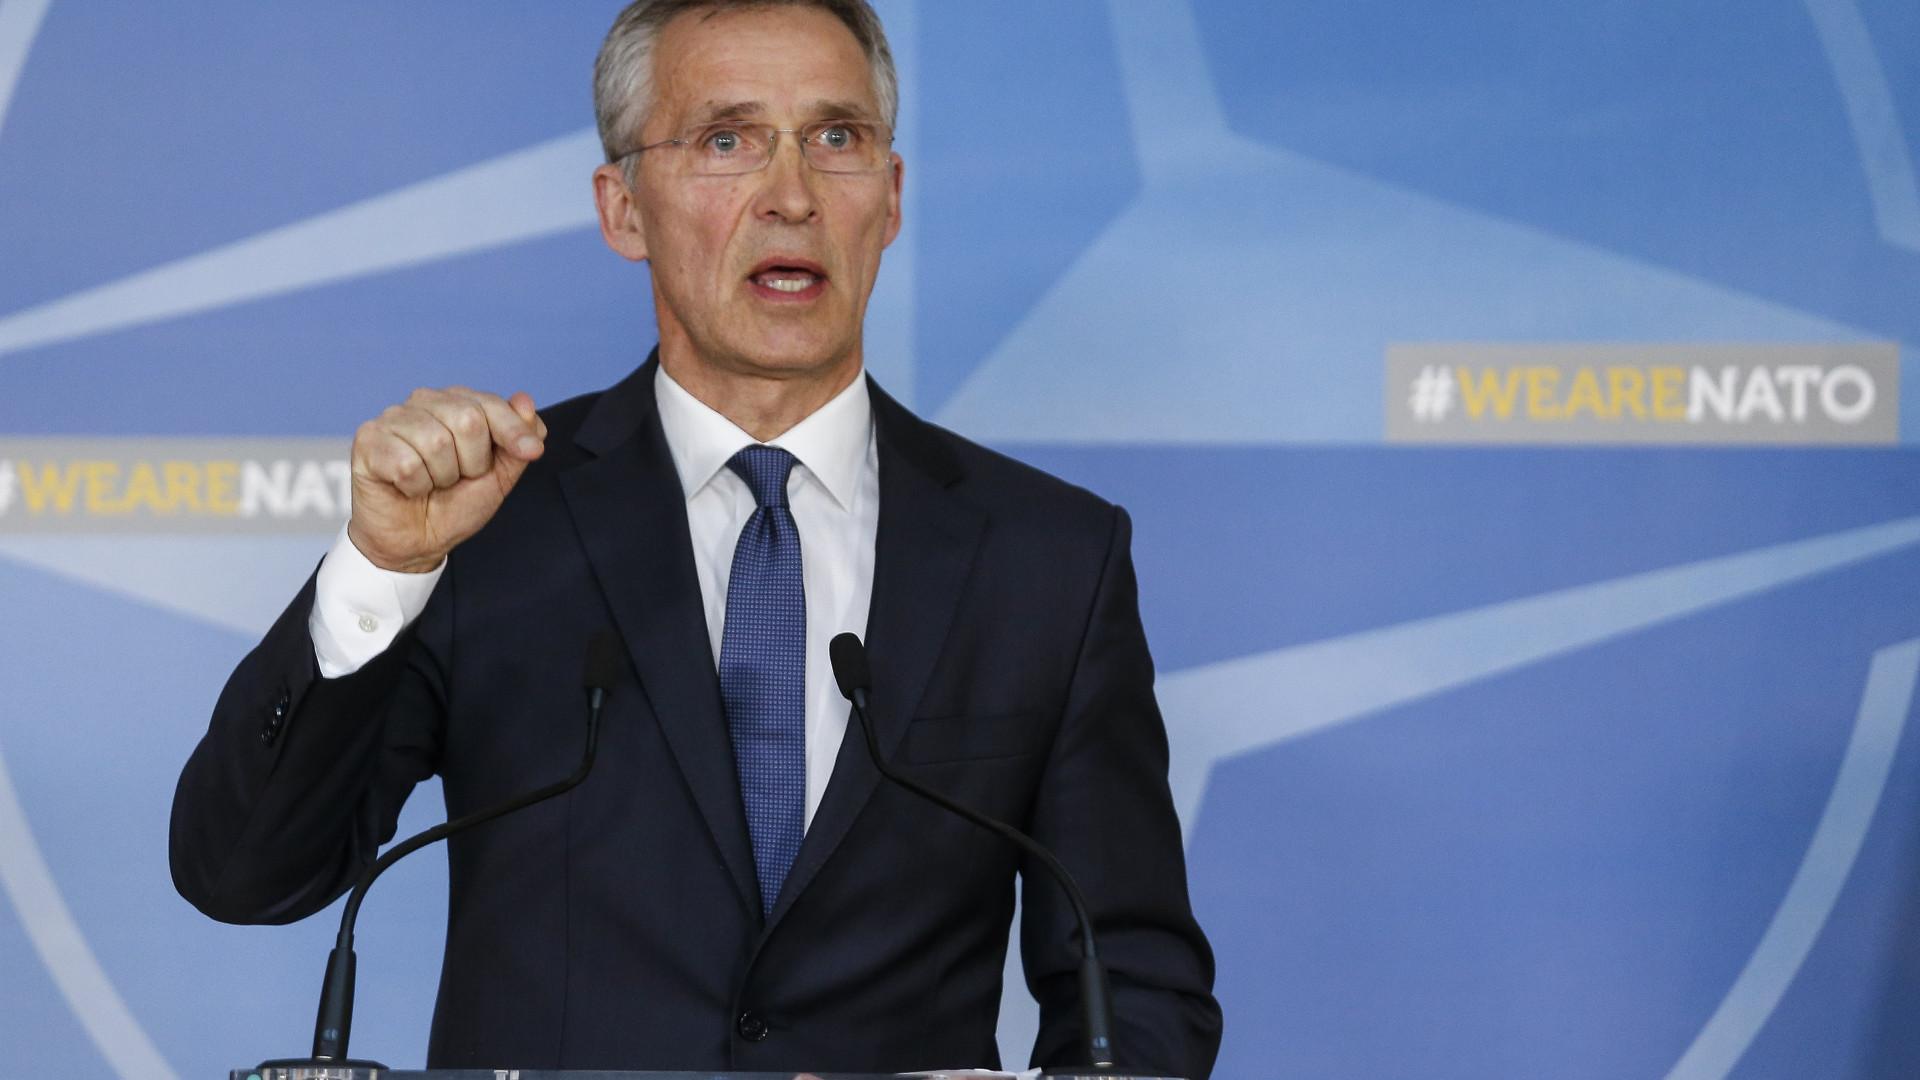 NATO diz que todos os aliados apoiaram ataques na Síria